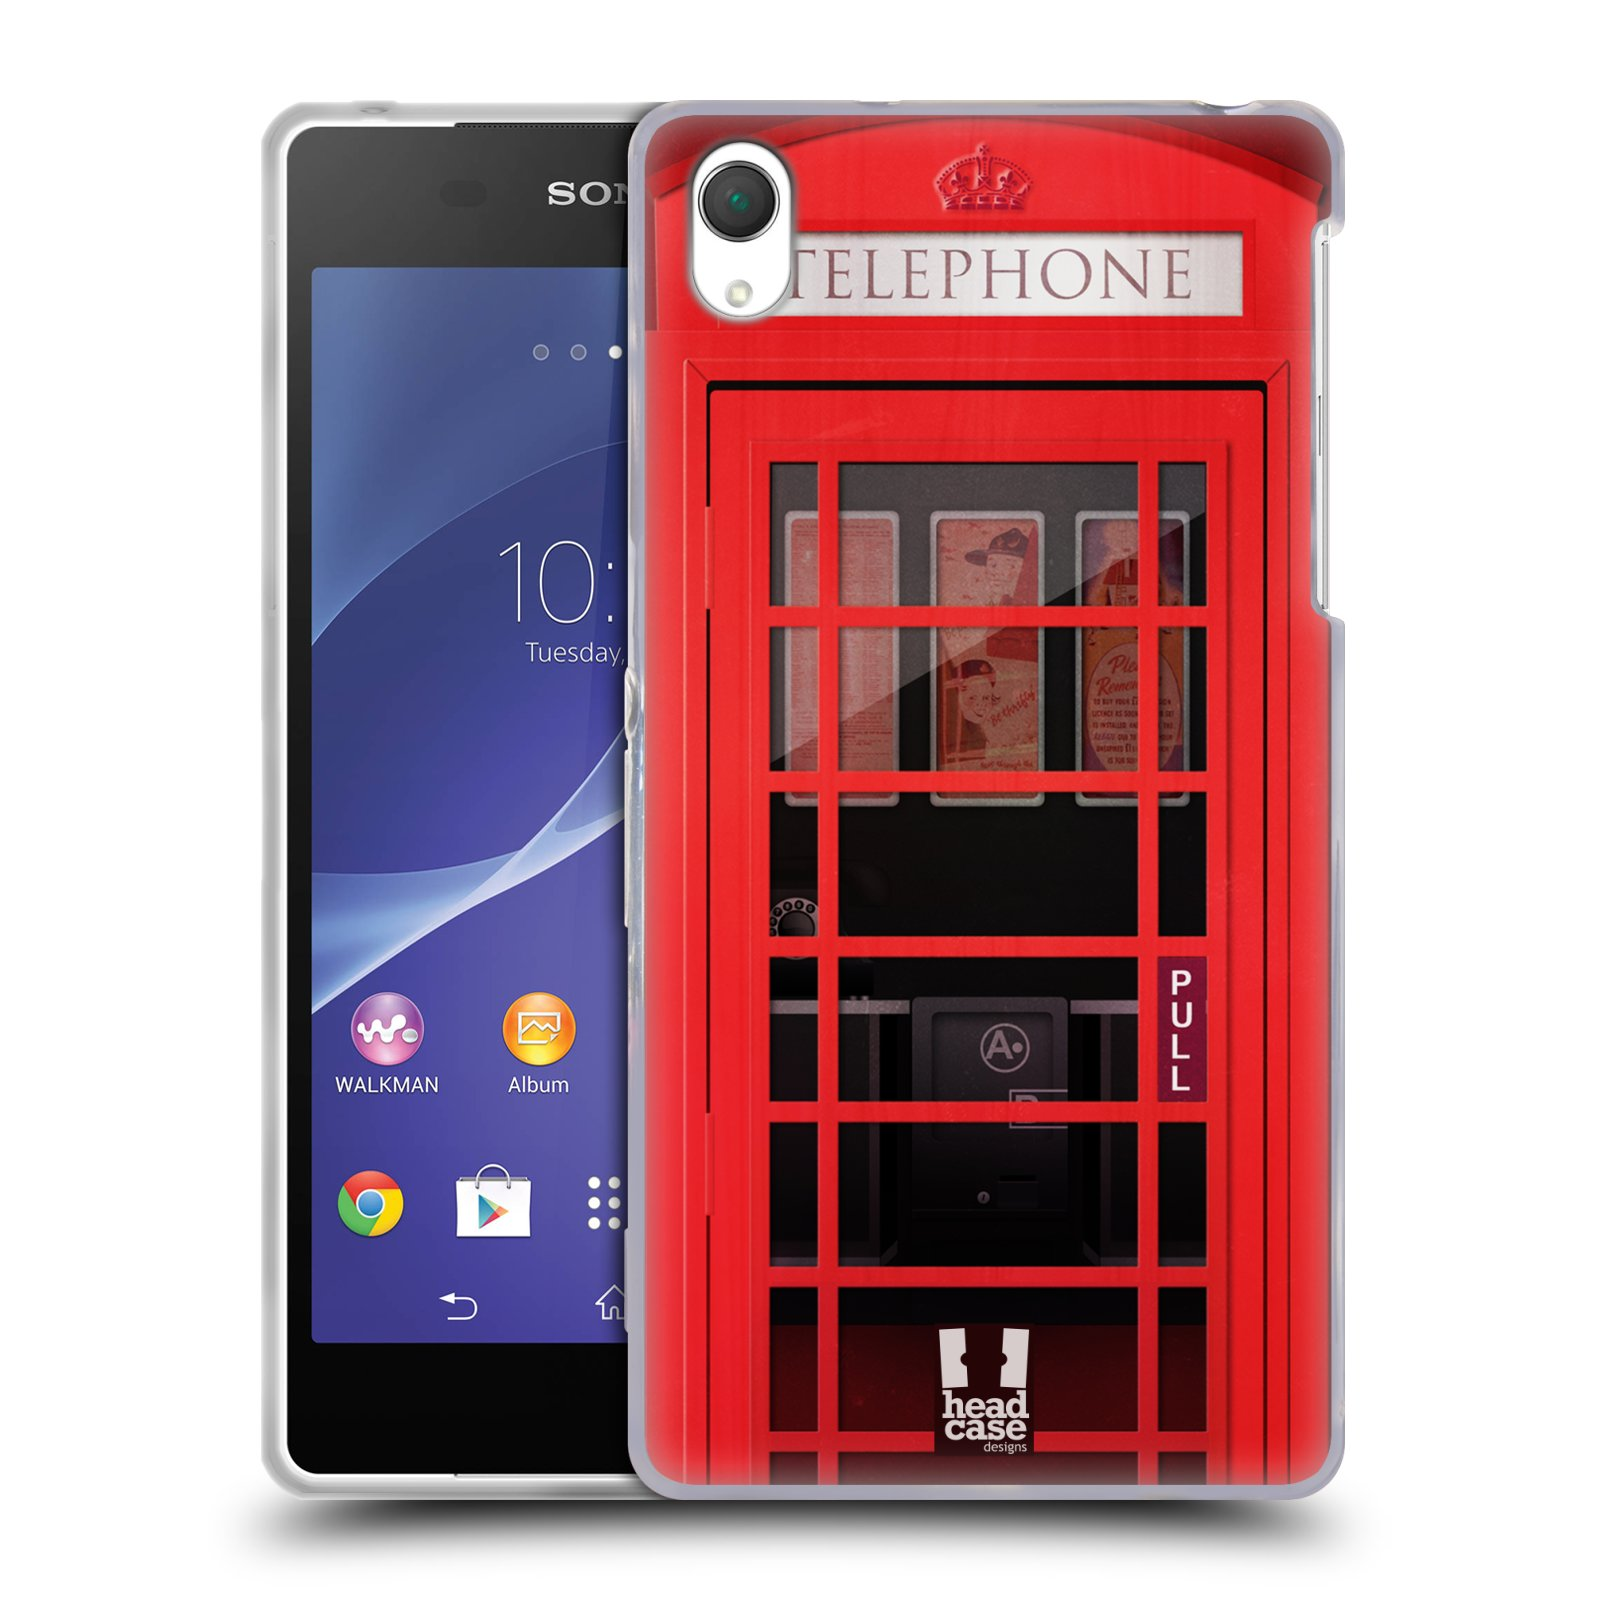 Silikonové pouzdro na mobil Sony Xperia Z2 D6503 HEAD CASE TELEFONNÍ BUDKA